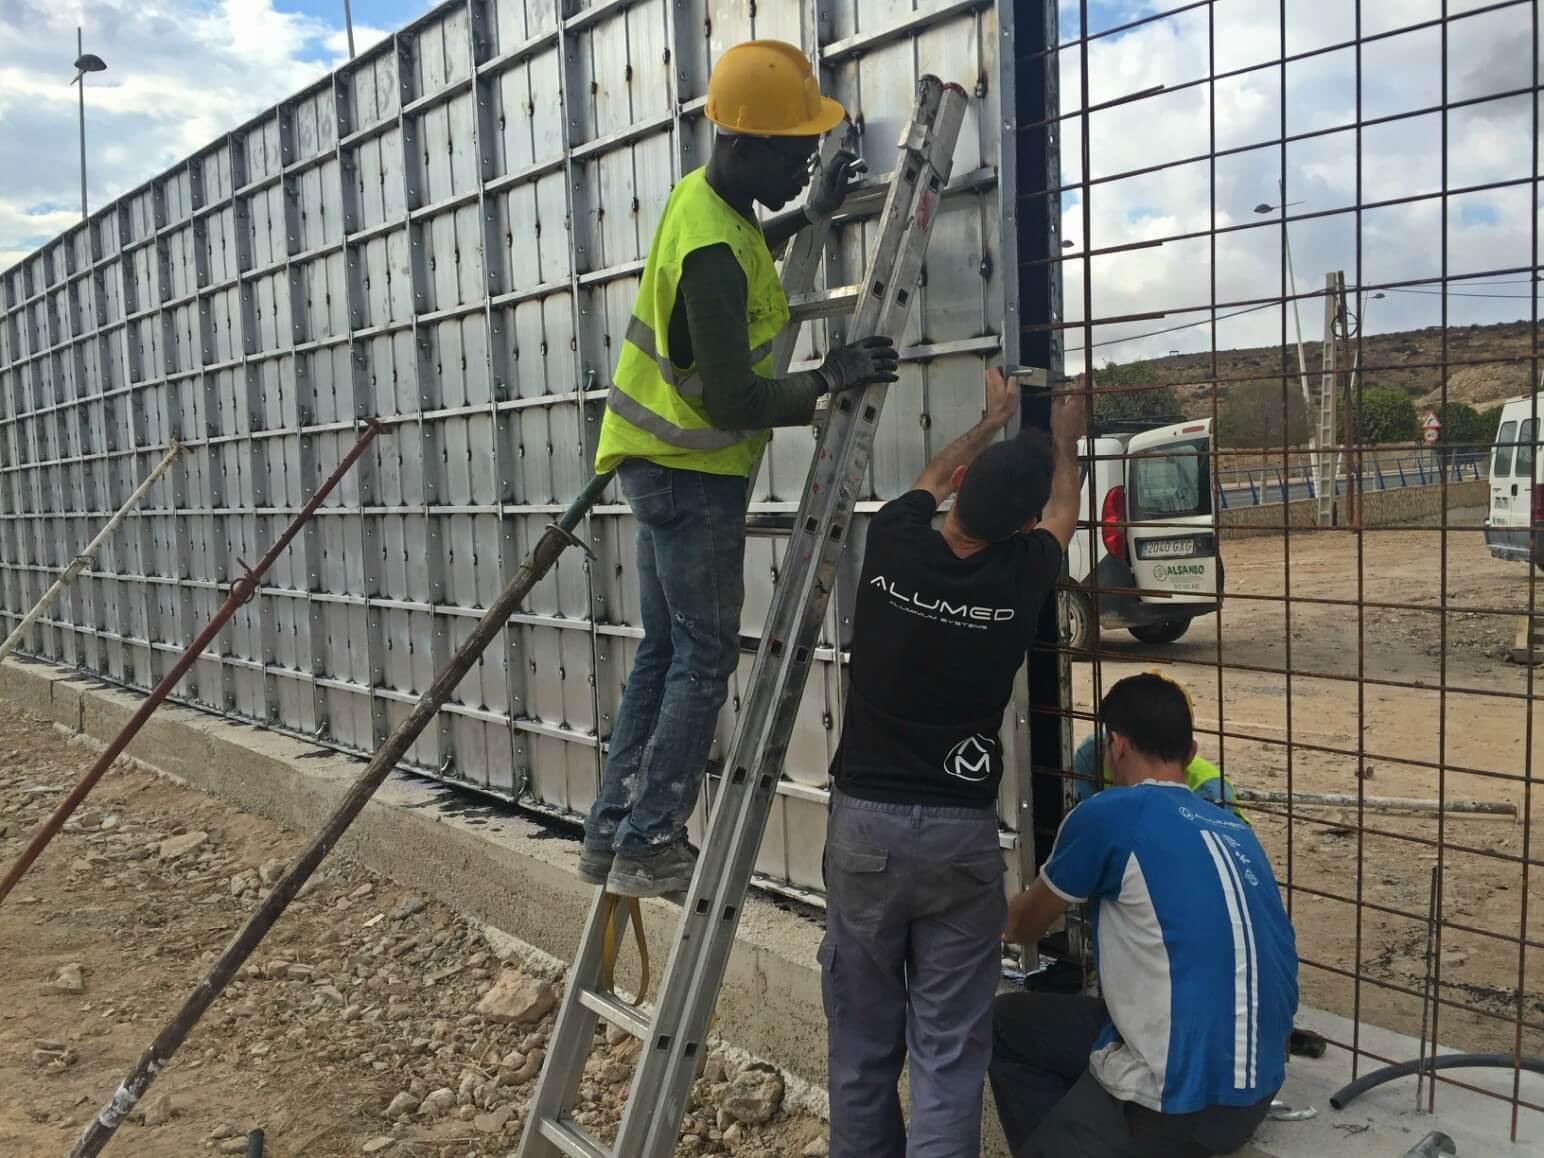 proyecto muro perimetral encofrados de aluminio construccion strong forms alicante 4